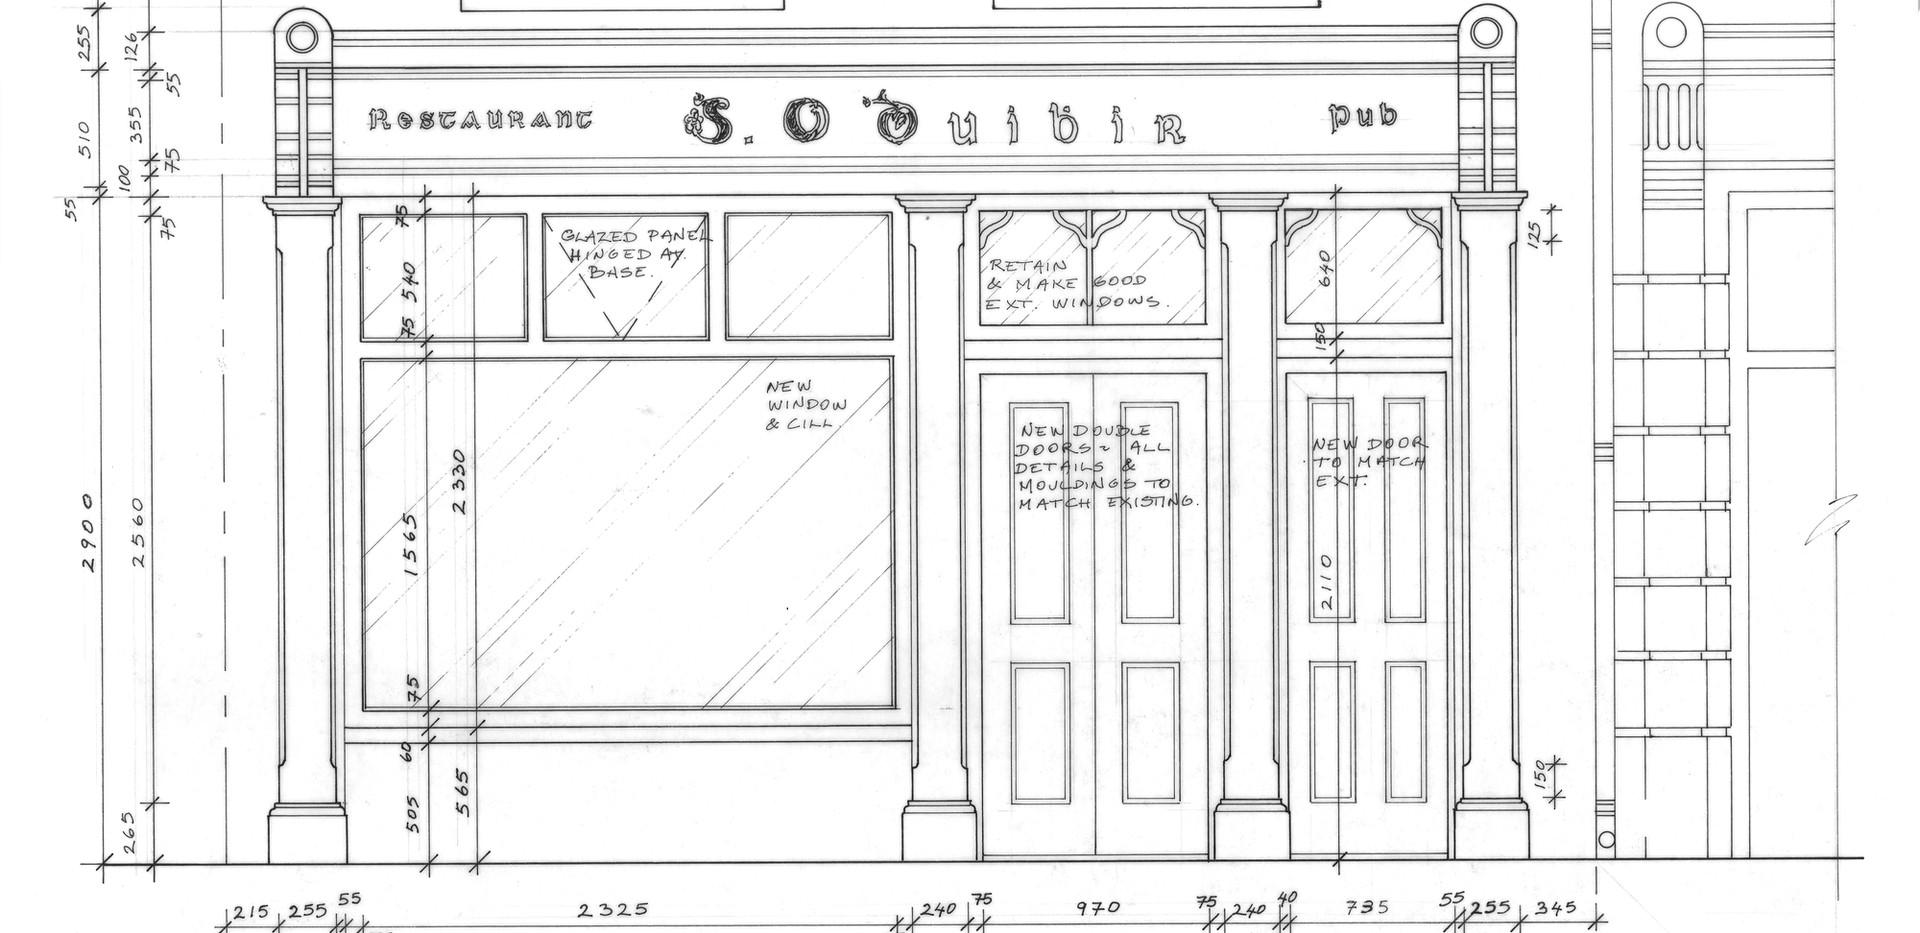 AM Design, Traditional Irish Pub Design & Fit Out, Angela Murphy Design Associates, Ltd., Bray Co. Wicklow, www.amdesign.ie @amdesignireland Crotty's Pub, The Square, Kilrush, Co. Clare, extension to O'Dwyers Shop, www.crottyspubkilrush.com